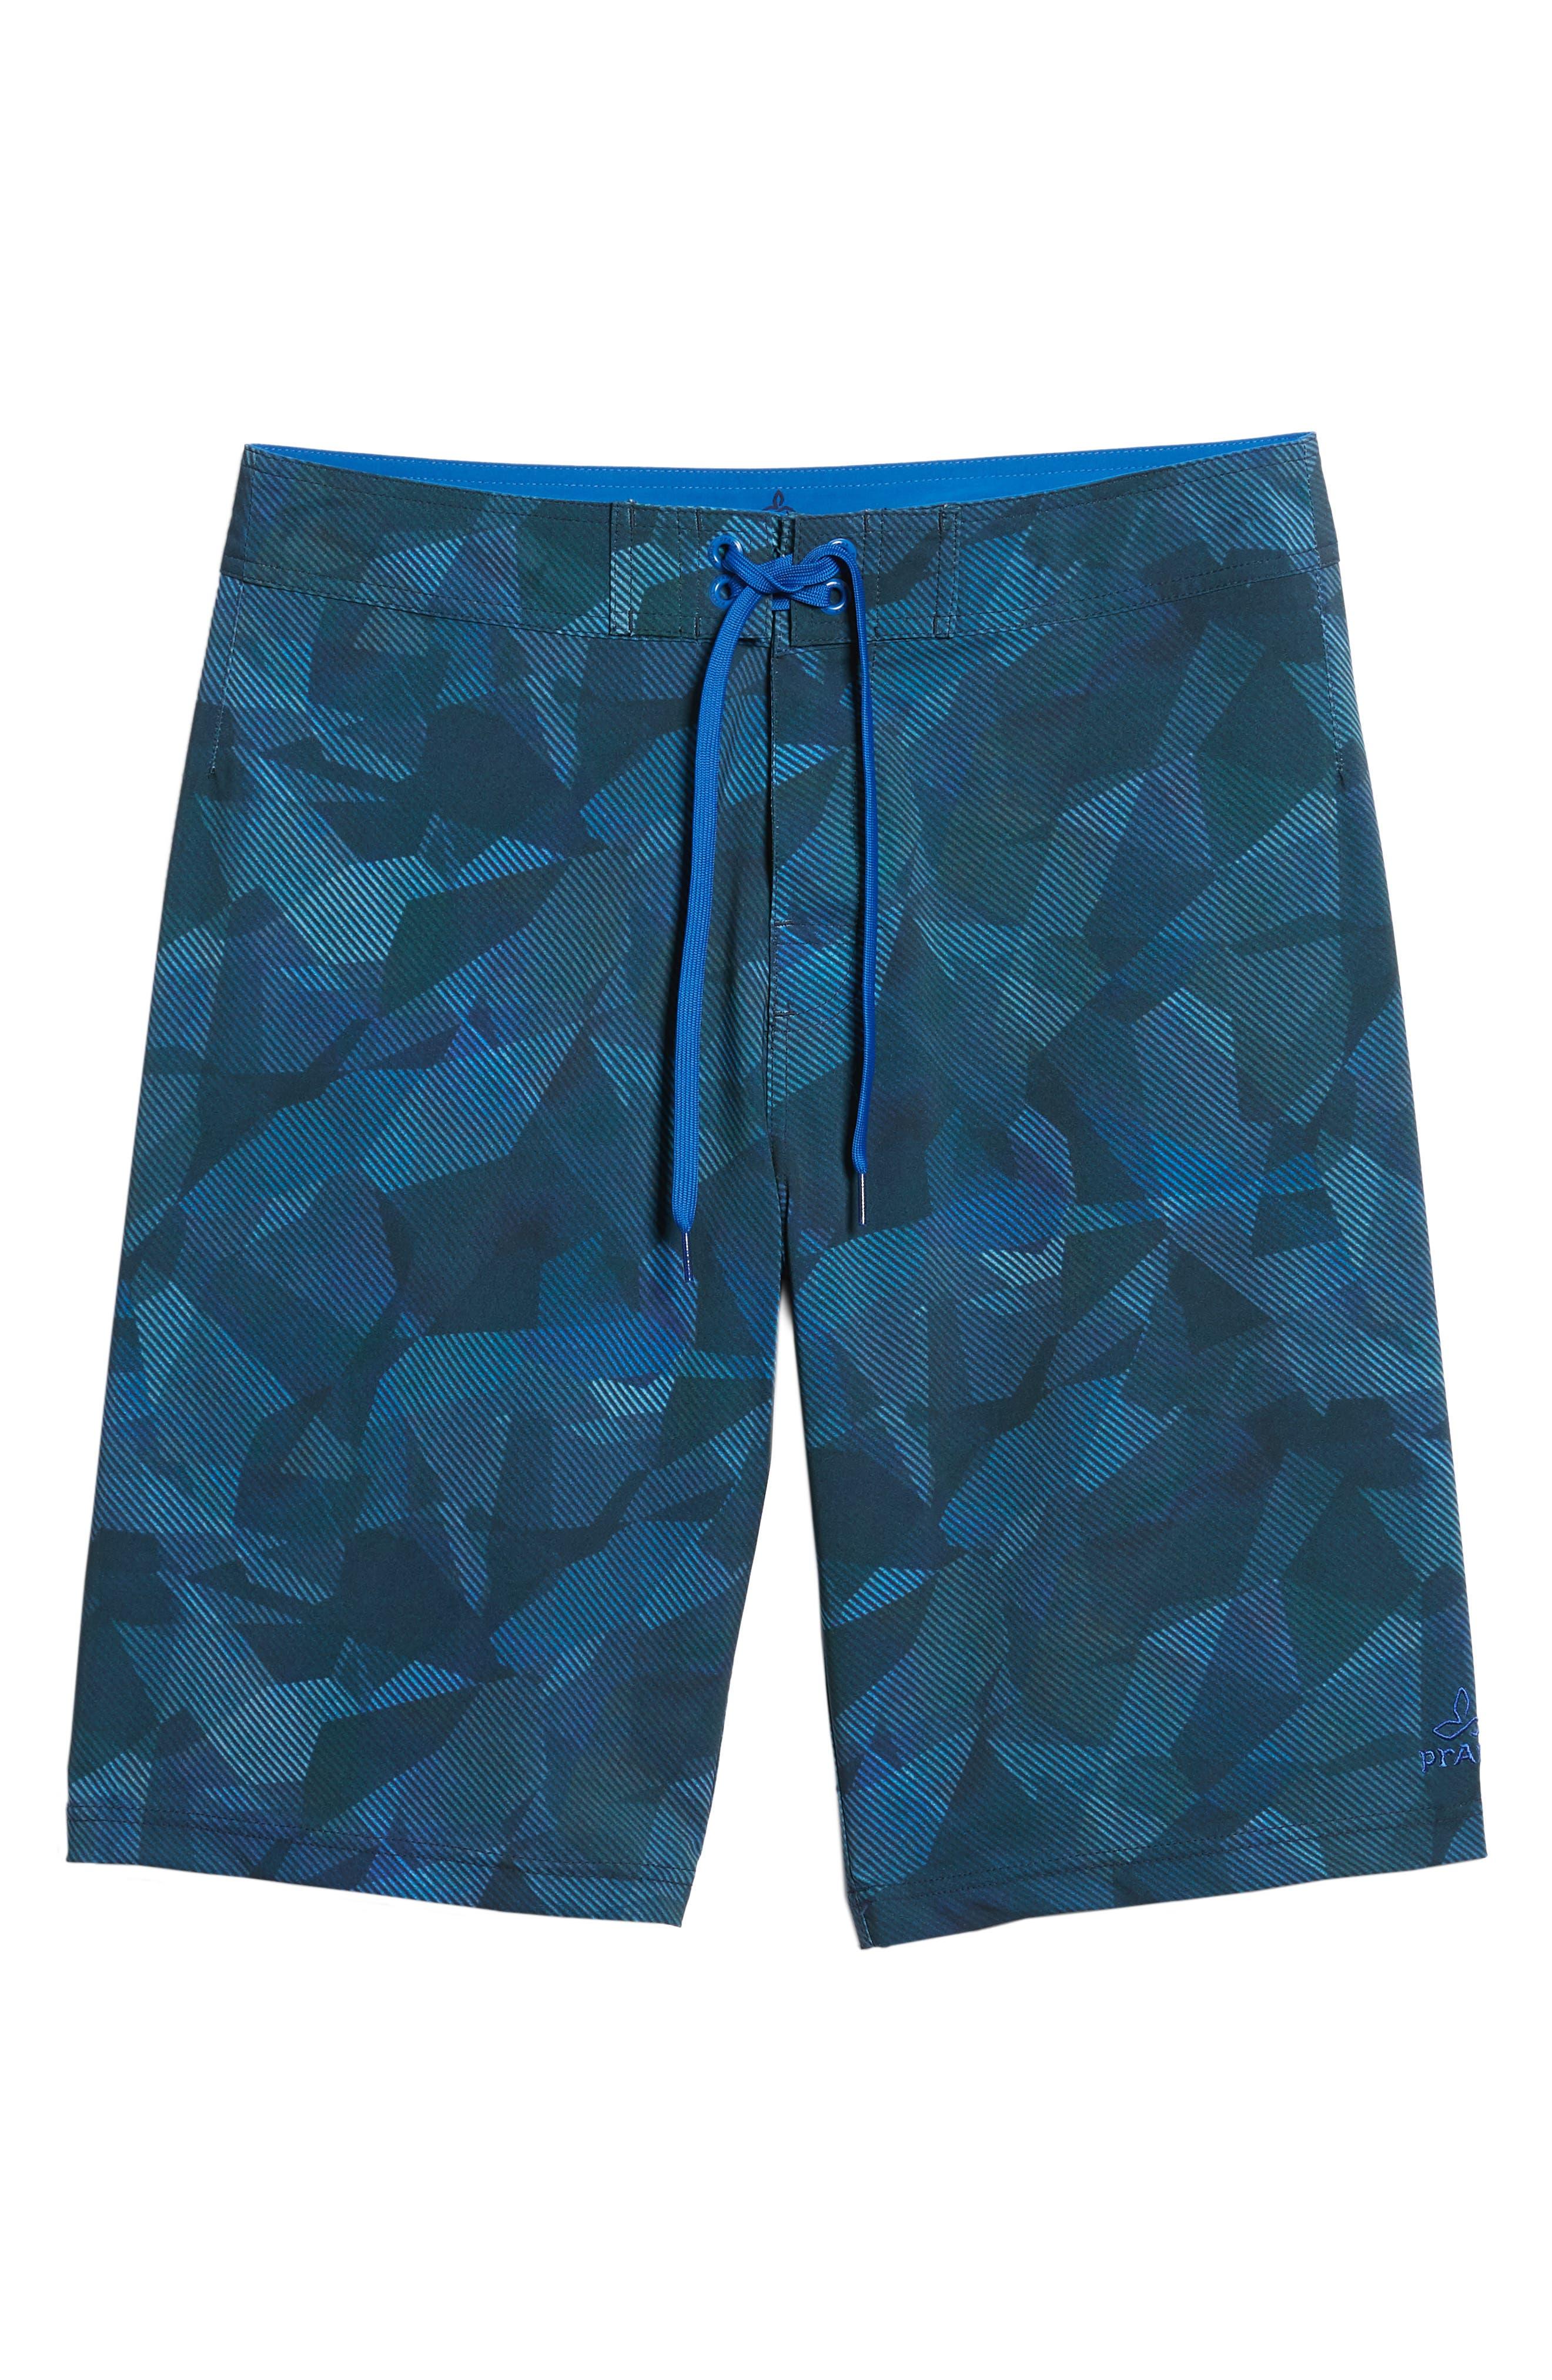 'Sediment' Stretch Board Shorts,                             Main thumbnail 1, color,                             Island Blue Hex